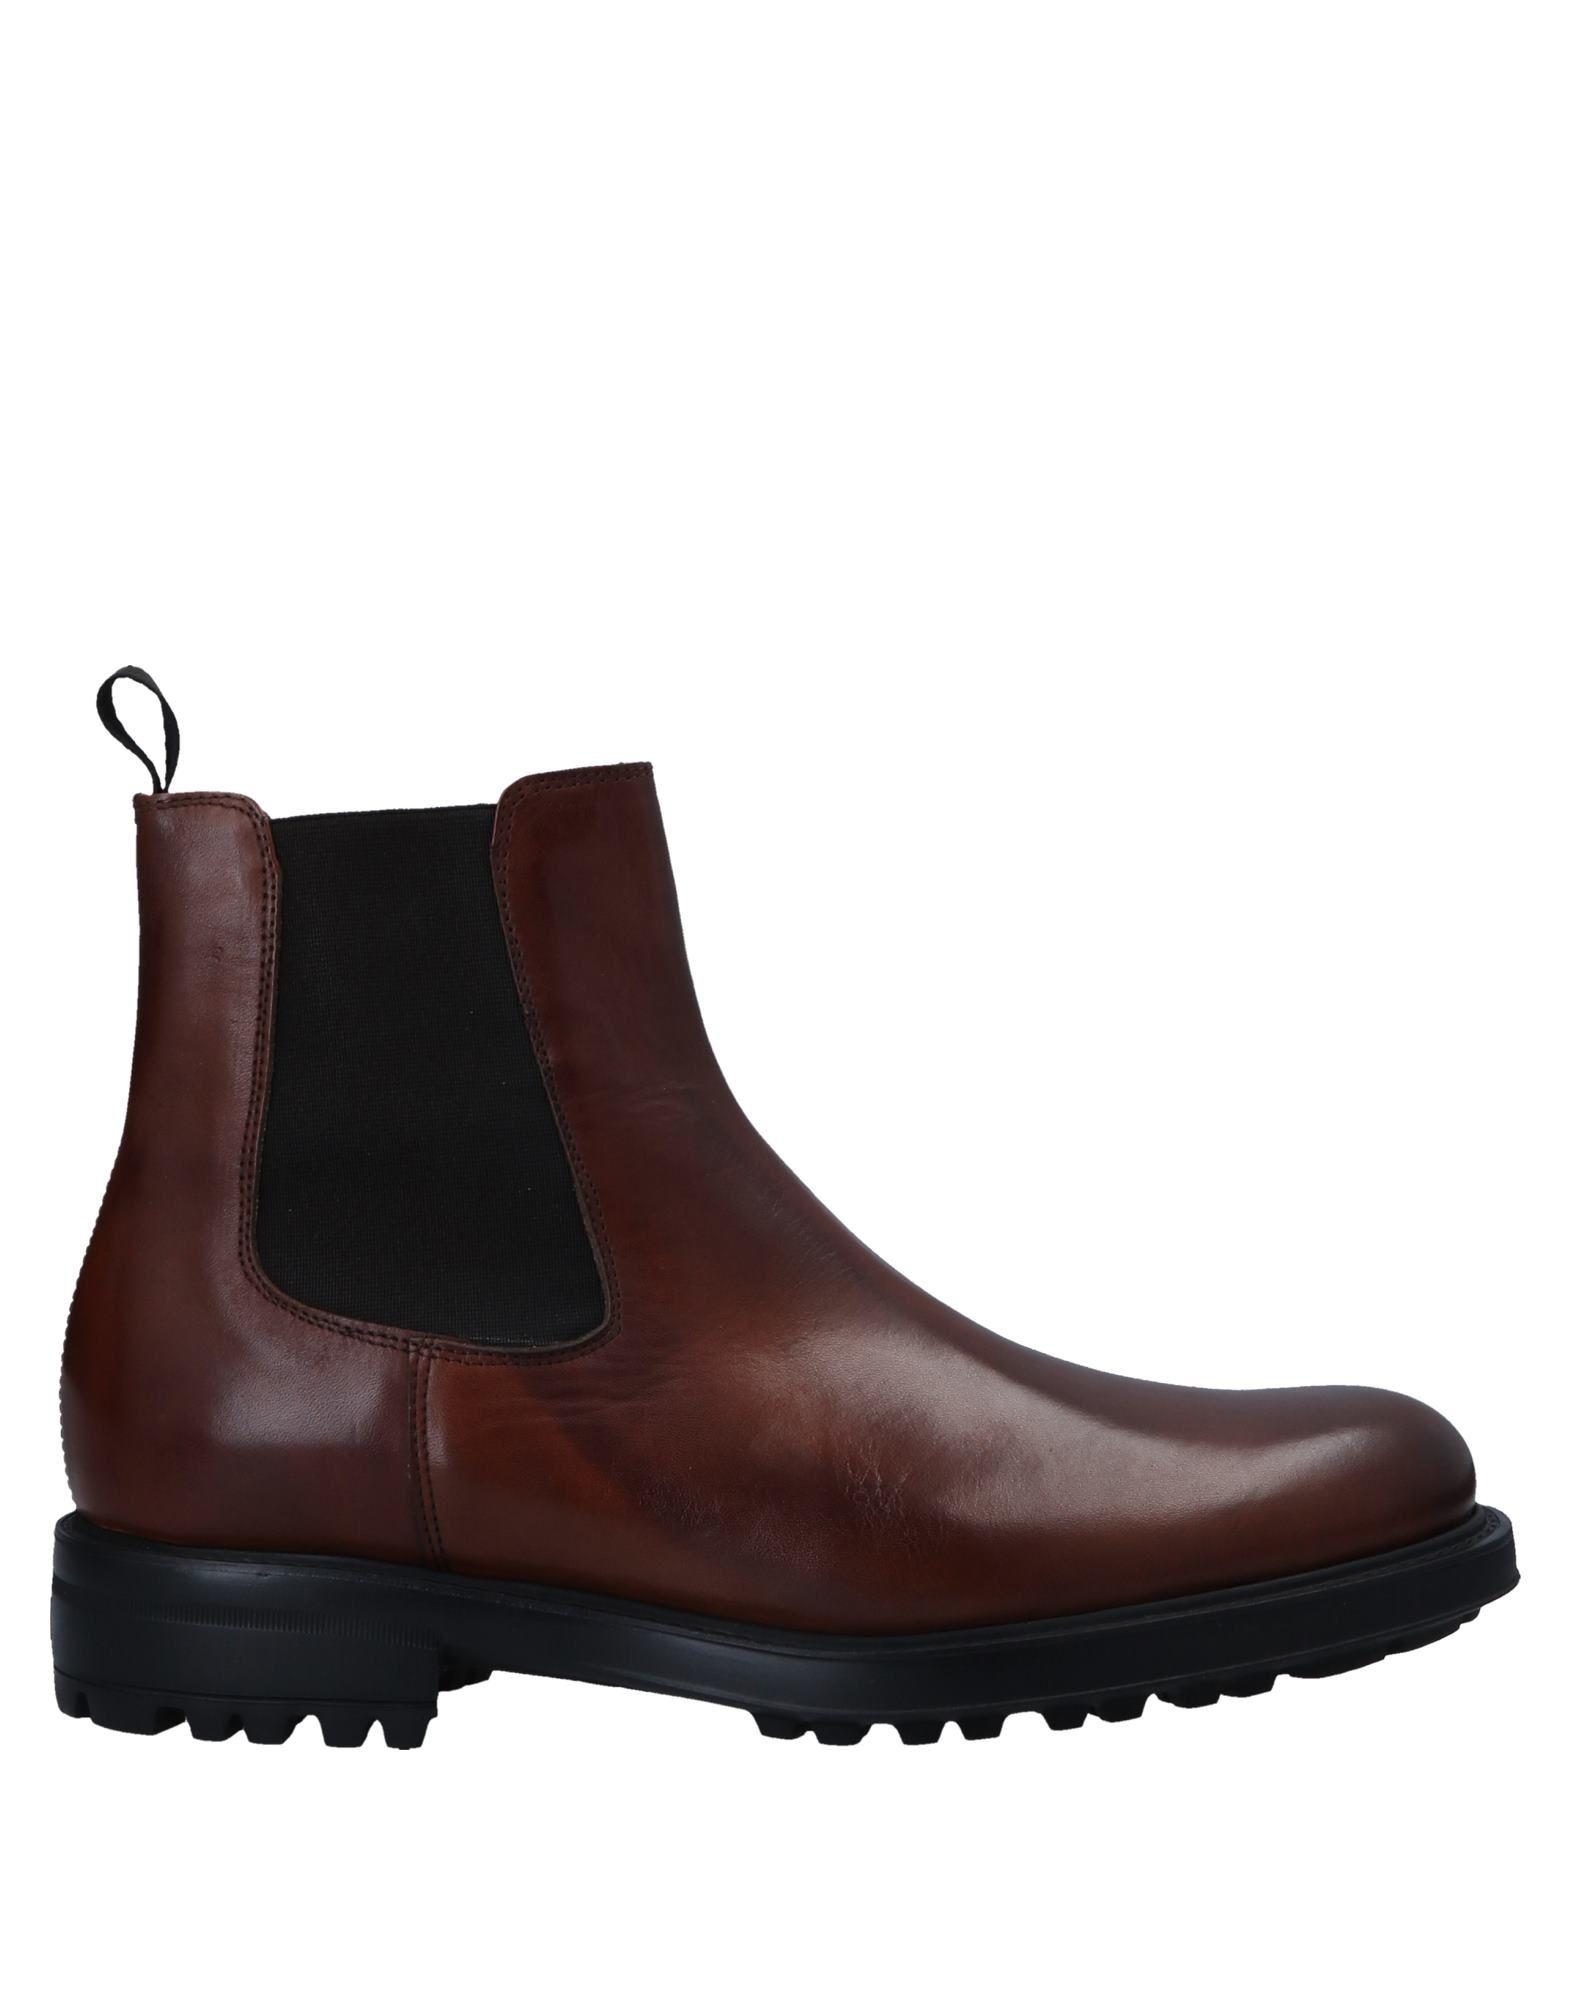 BALDININI Полусапоги и высокие ботинки полусапоги baldinini полусапоги